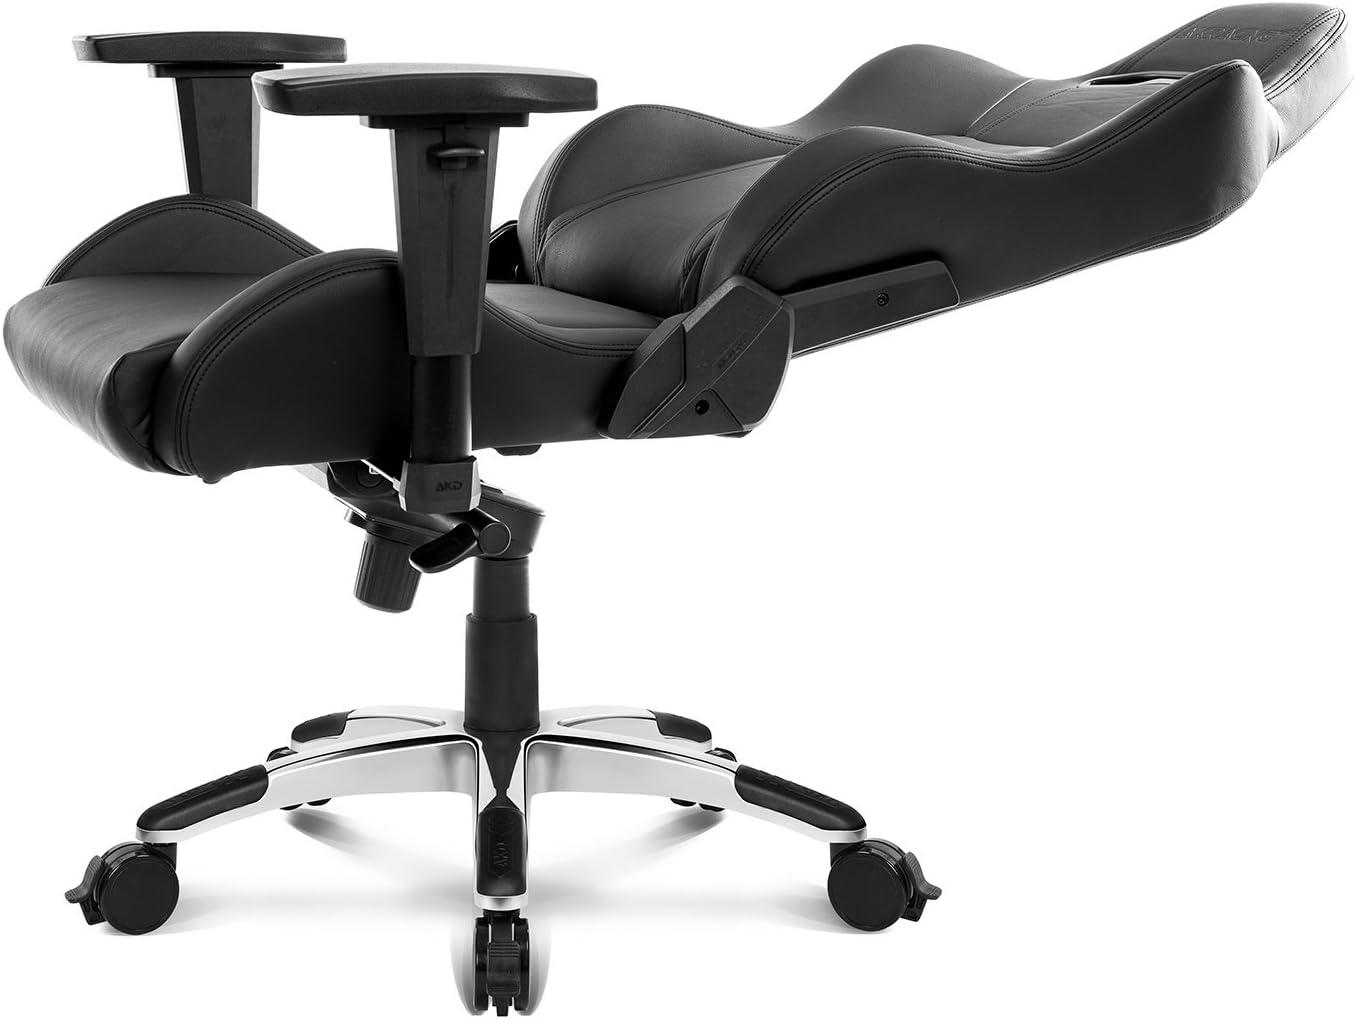 AKRacing オフィスチェア ゲーミングチェア Premium 低座面タイプ Raven レイブン AKR-PREMIUM/LOW-RAVEN